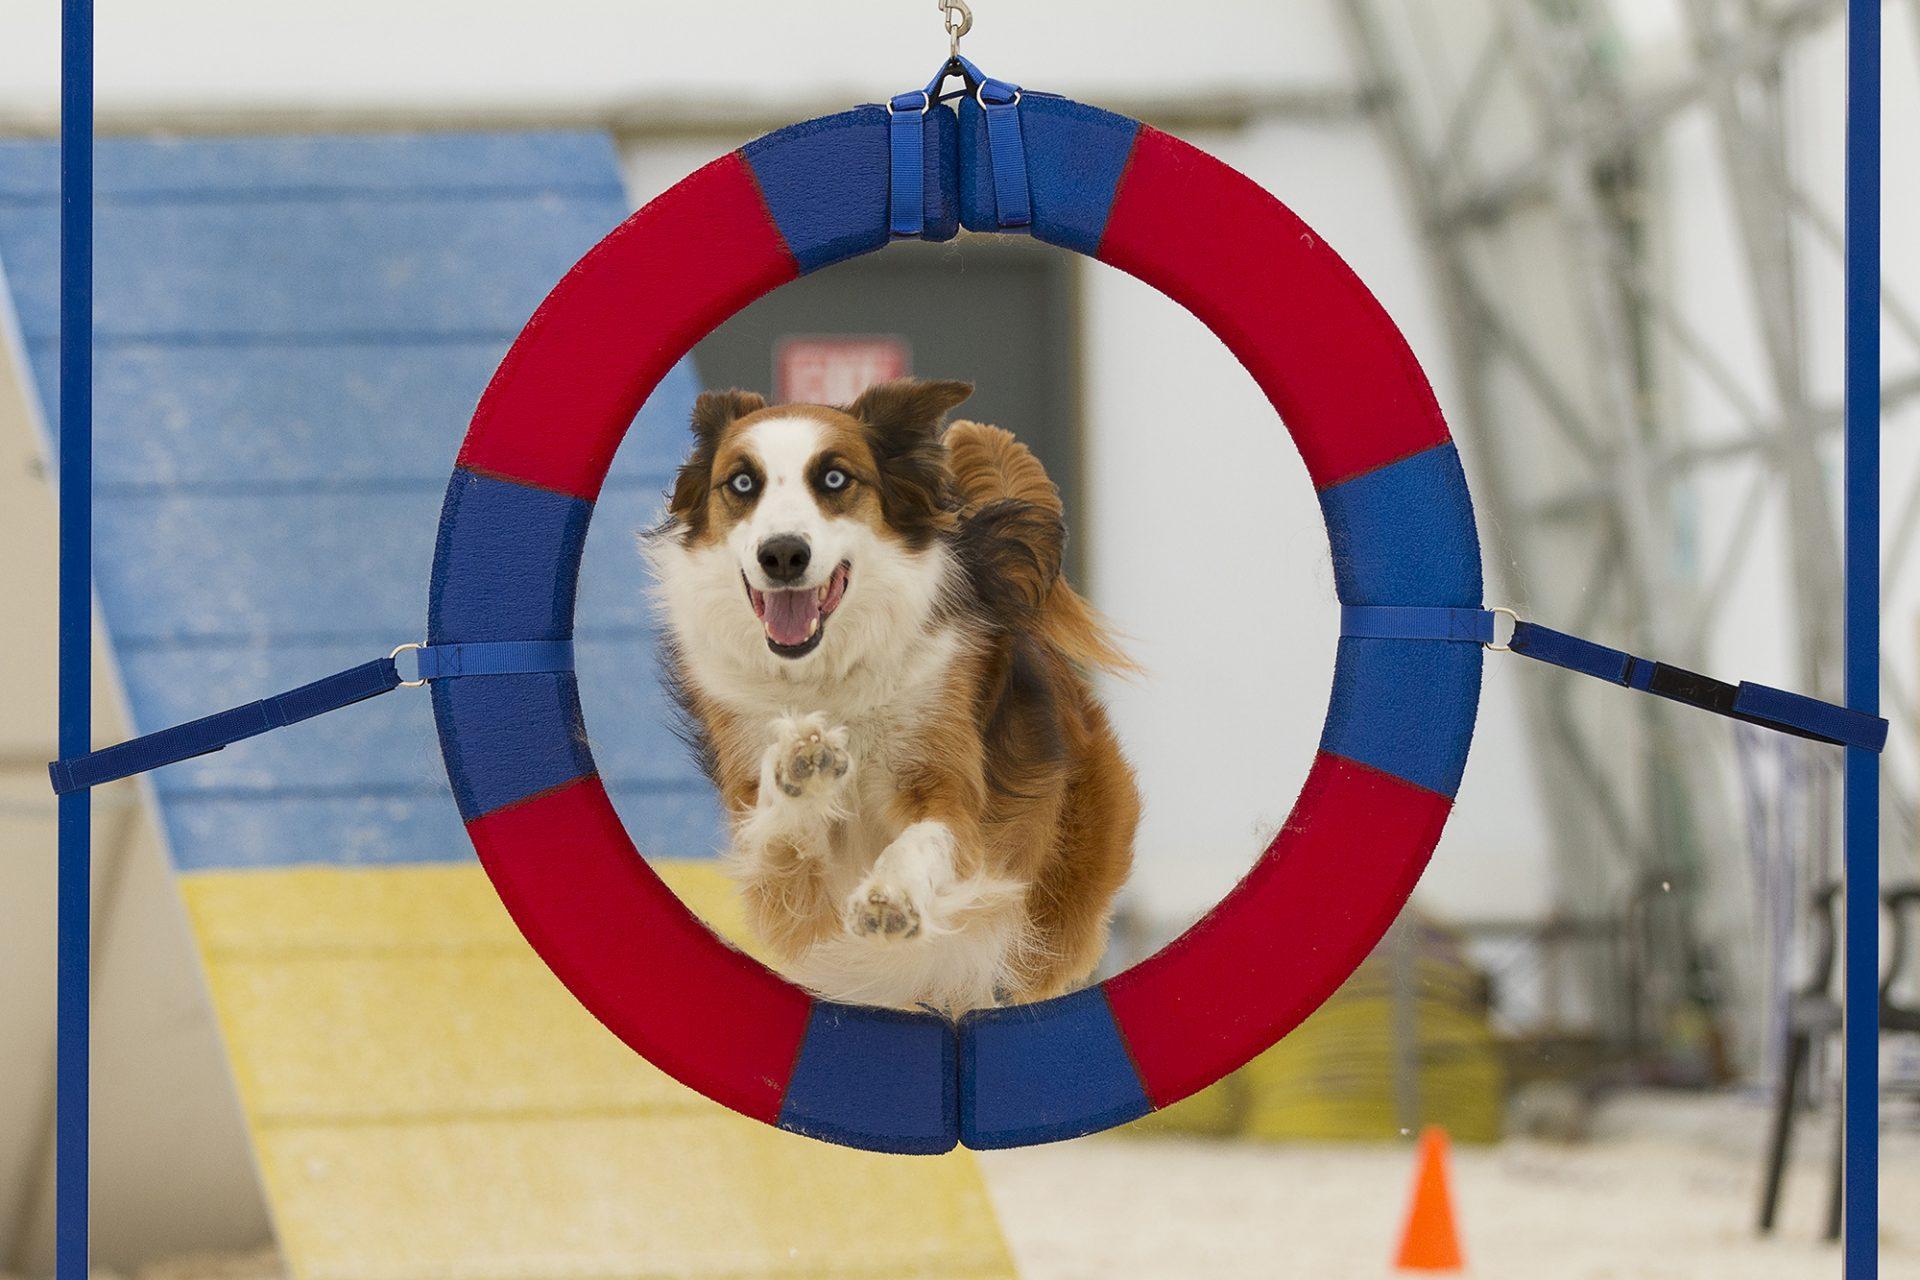 English Shepherd Dog through tire jump in dog agility